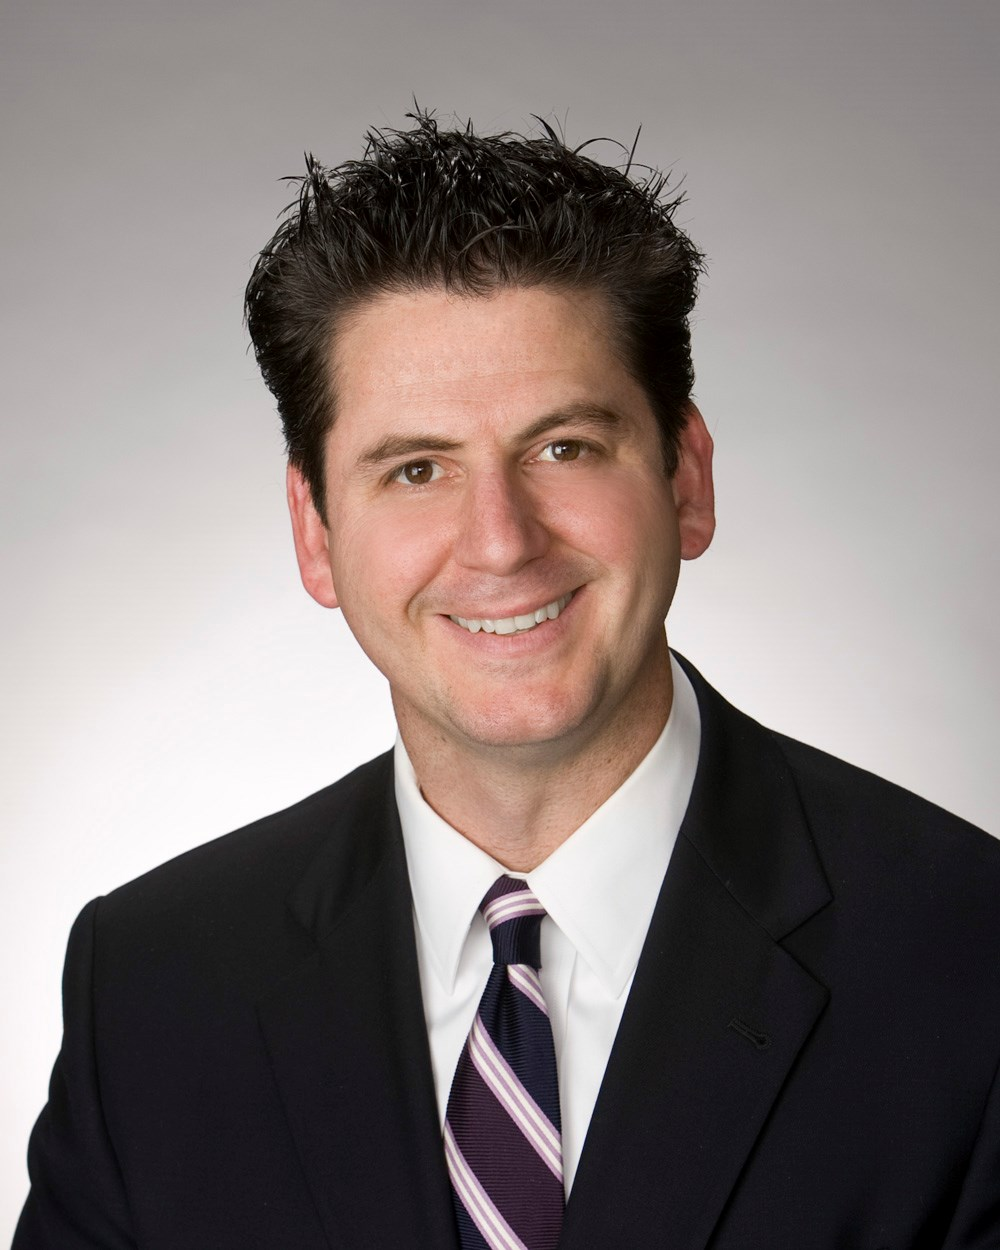 Patrick George, director, healthcare practice, KP Public Affairs.